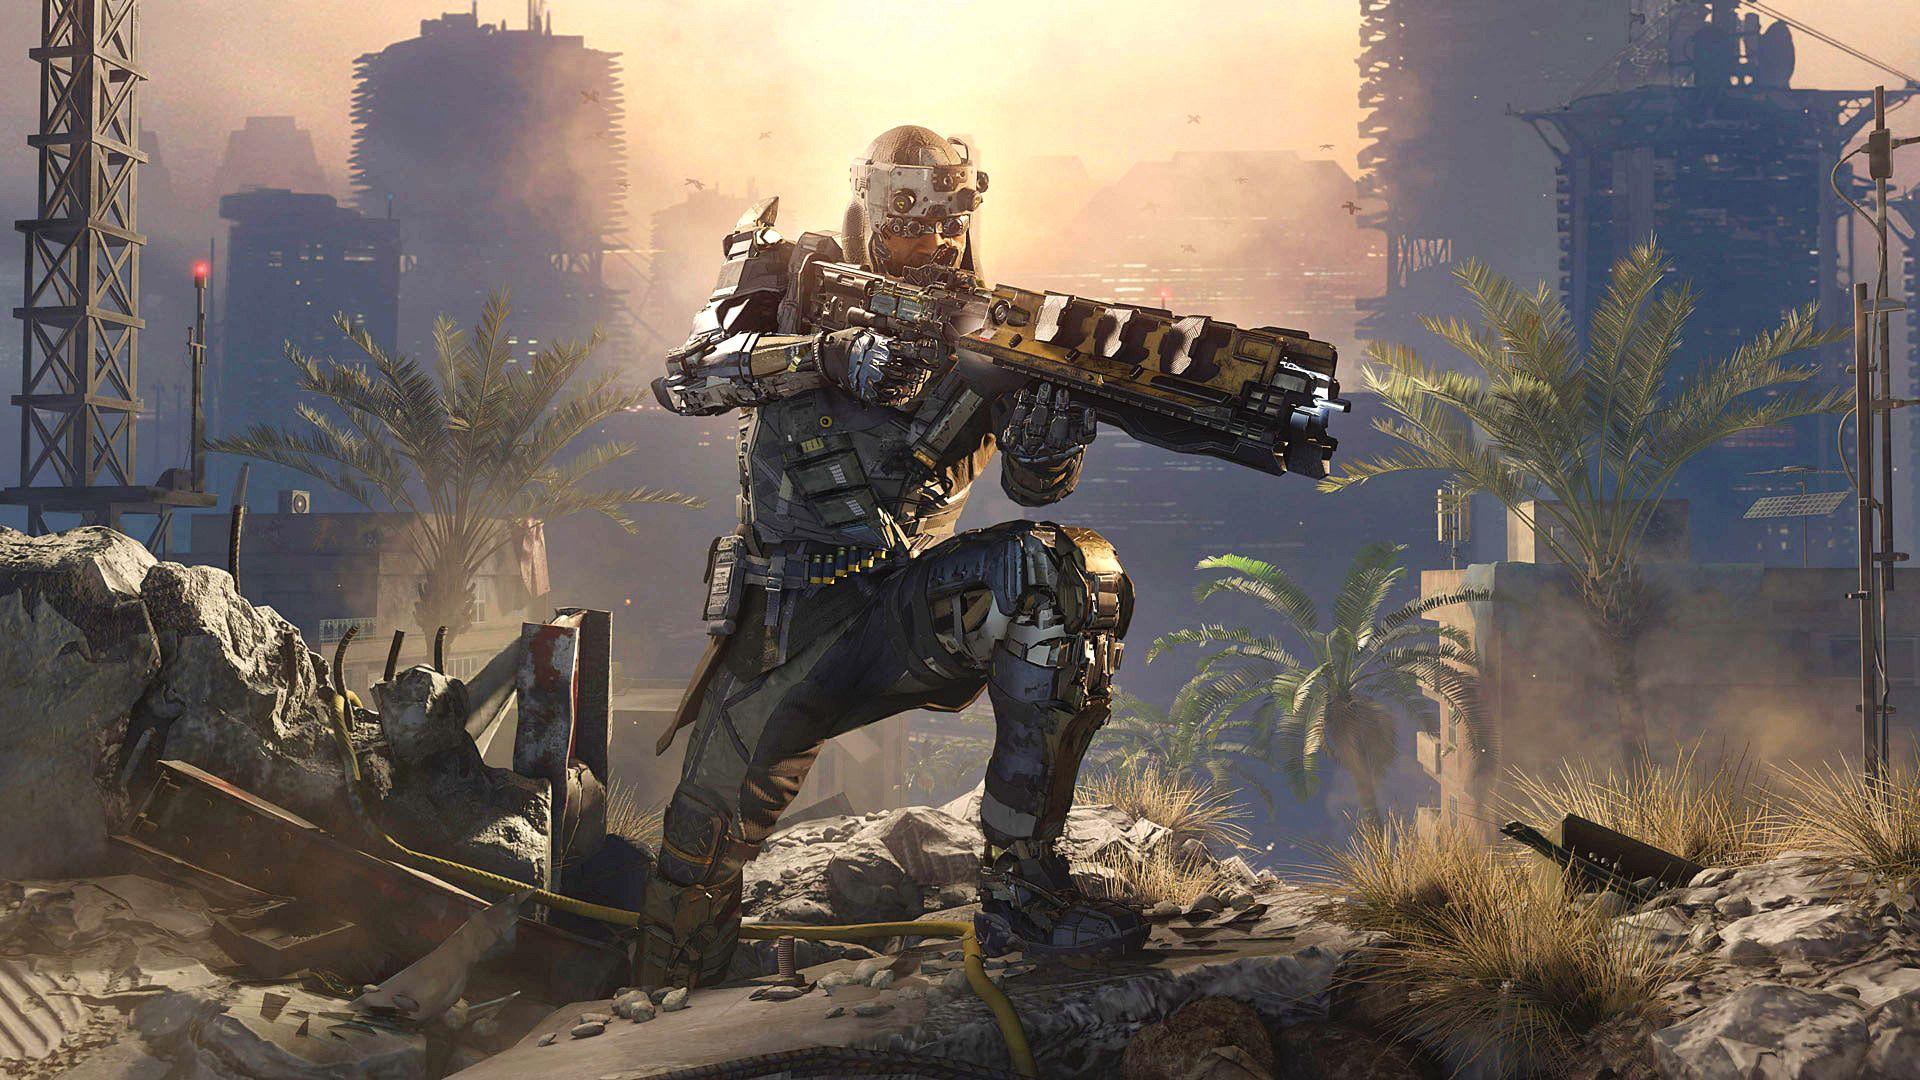 Cod Black Ops 3 Specialist Prophet Call Of Duty Black Ops 3 Call Of Duty Black Ops Iii Call Of Duty